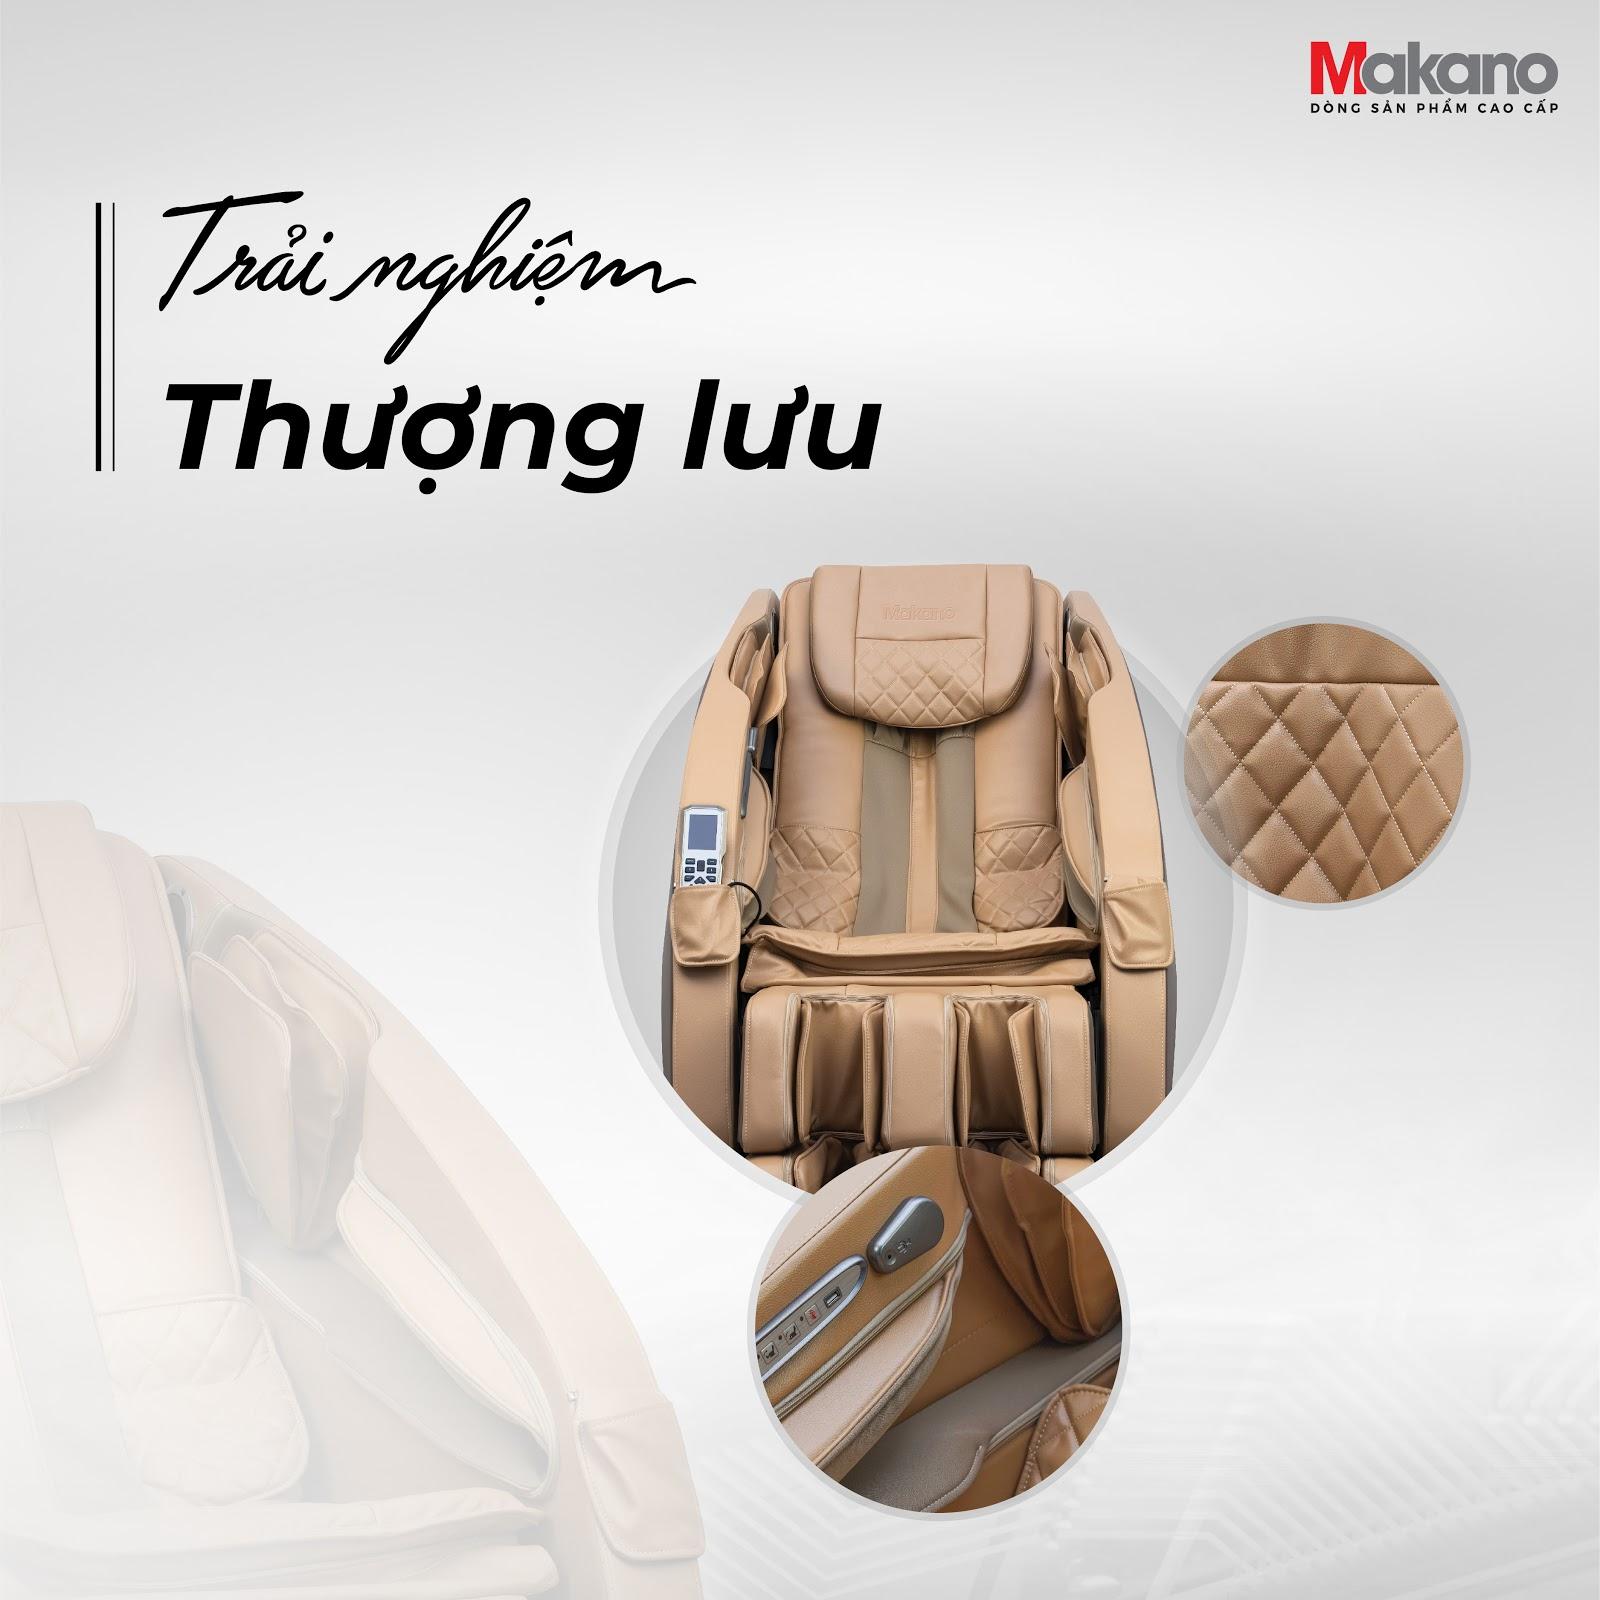 Ghế massage Makano sử dụng chất liệu da ghế bằng Microfiber PU